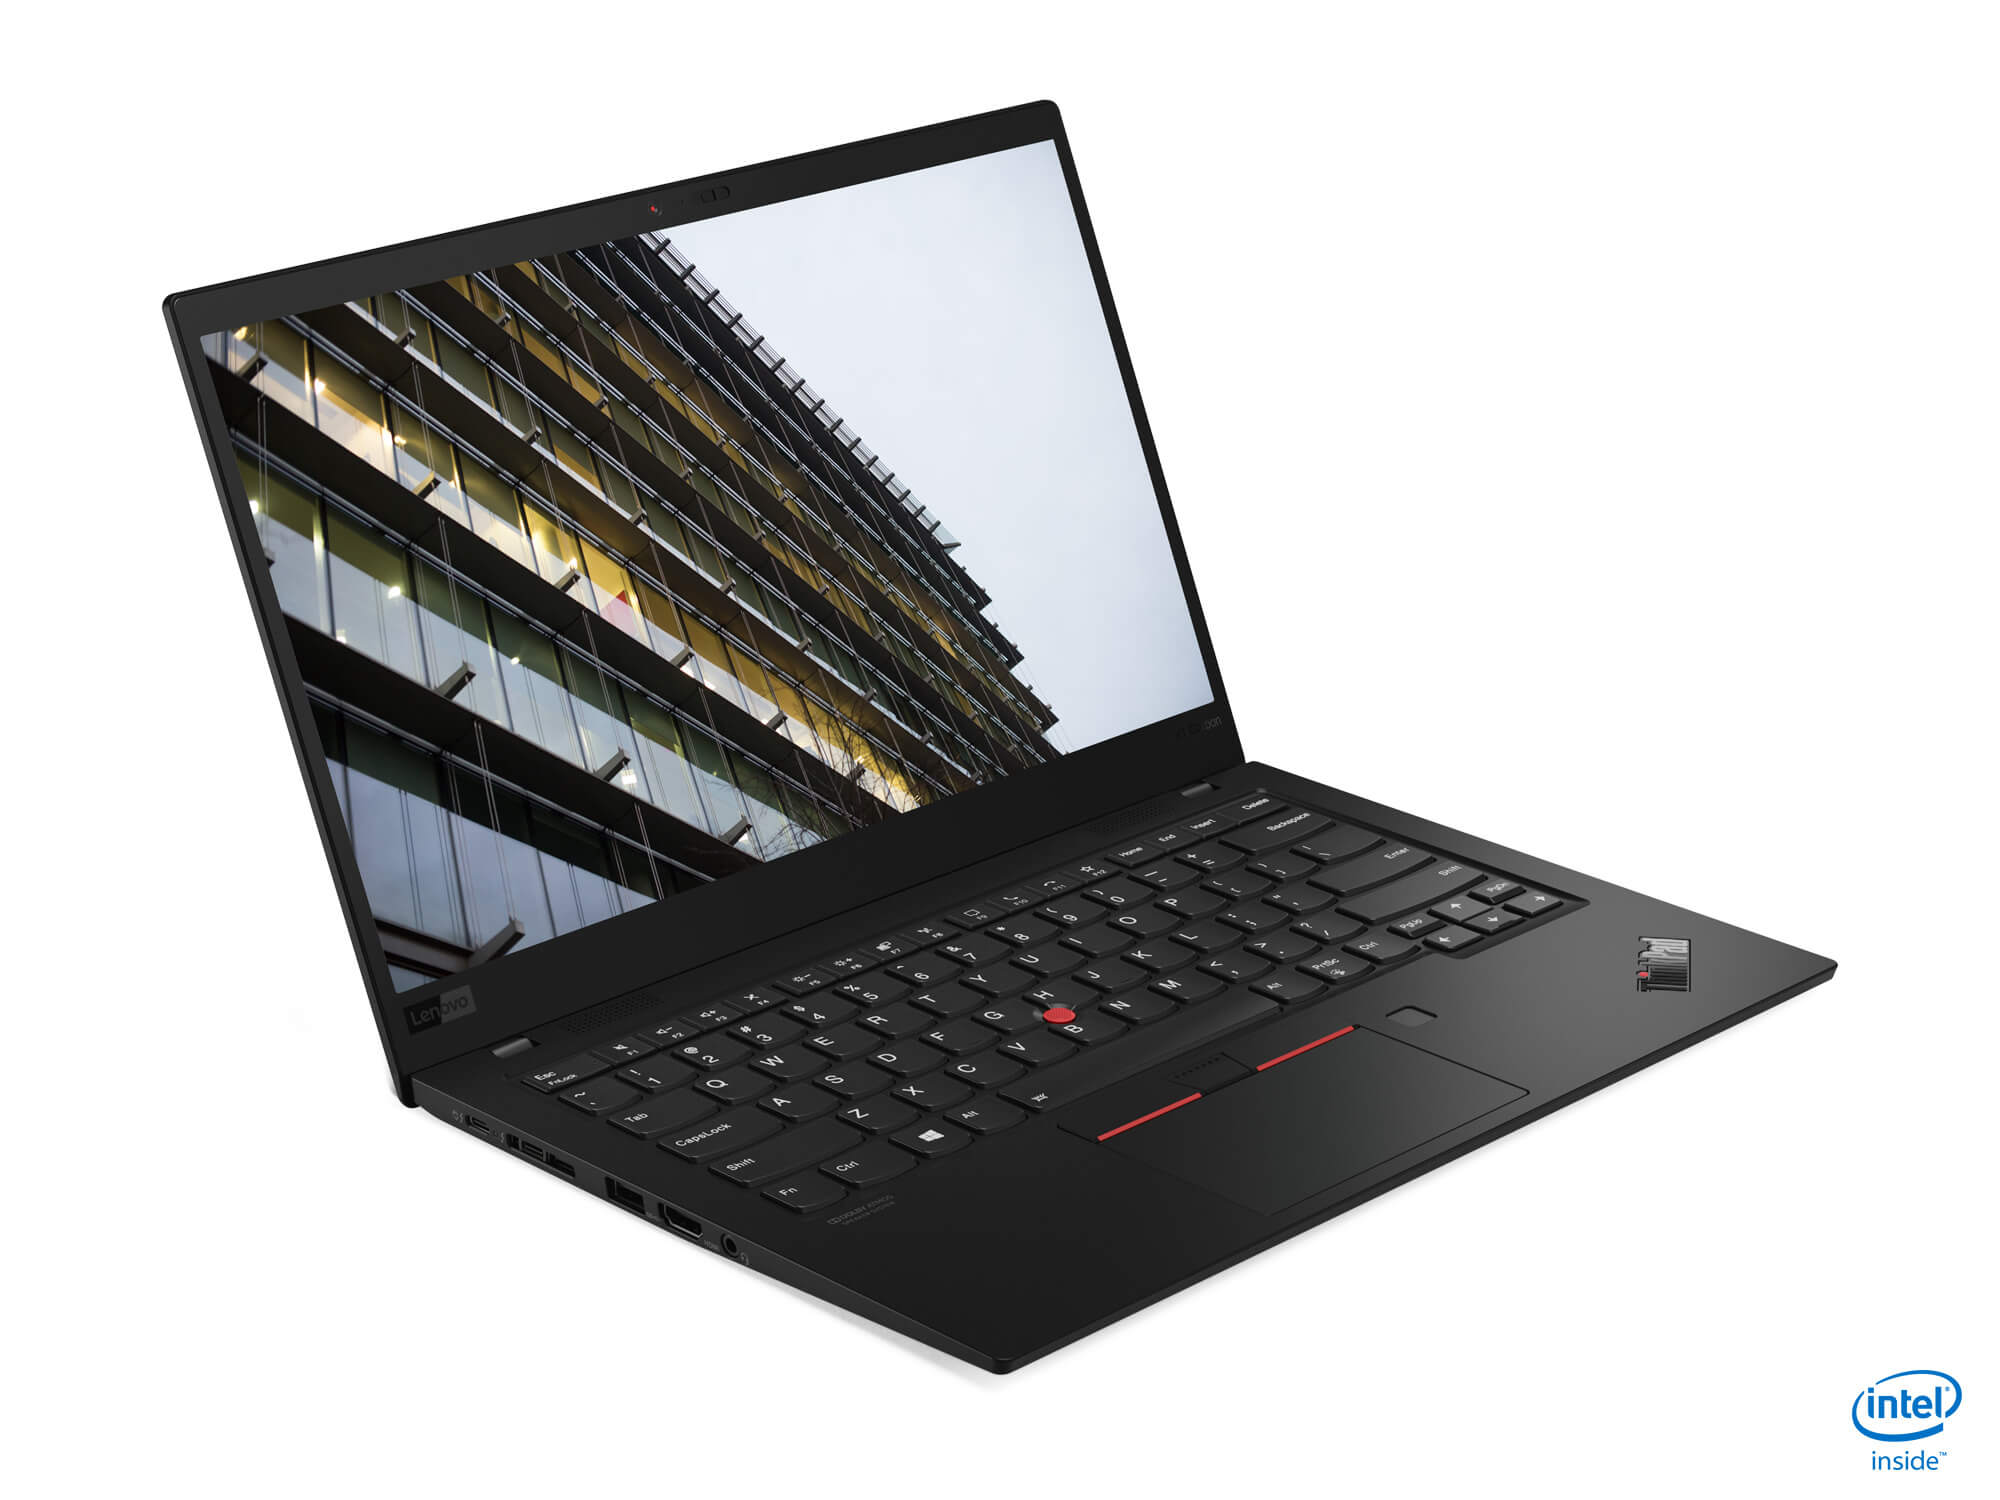 ThinkPad X1 Carbon Gen 8 3